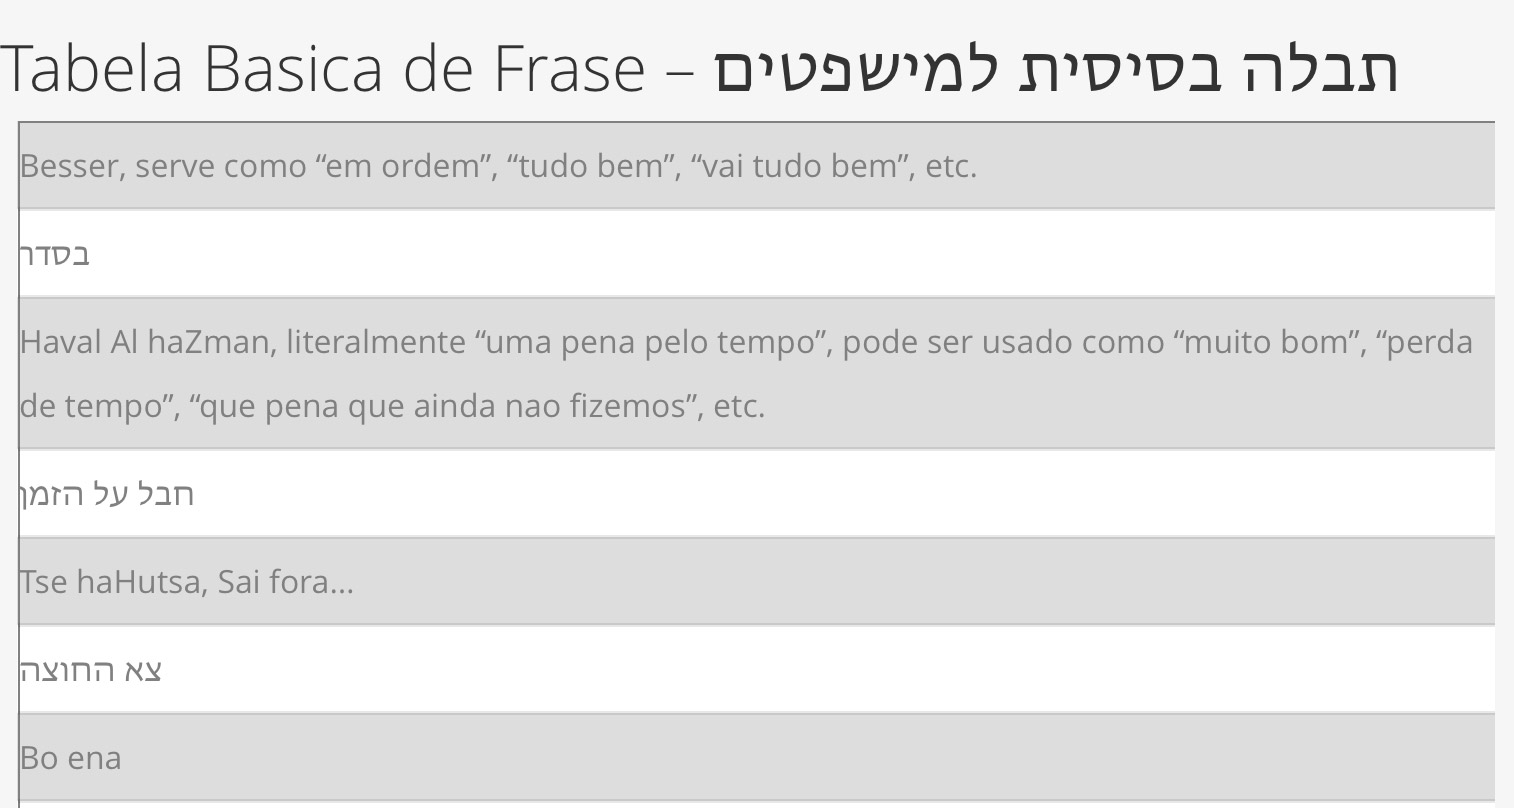 frases-em-hebraico